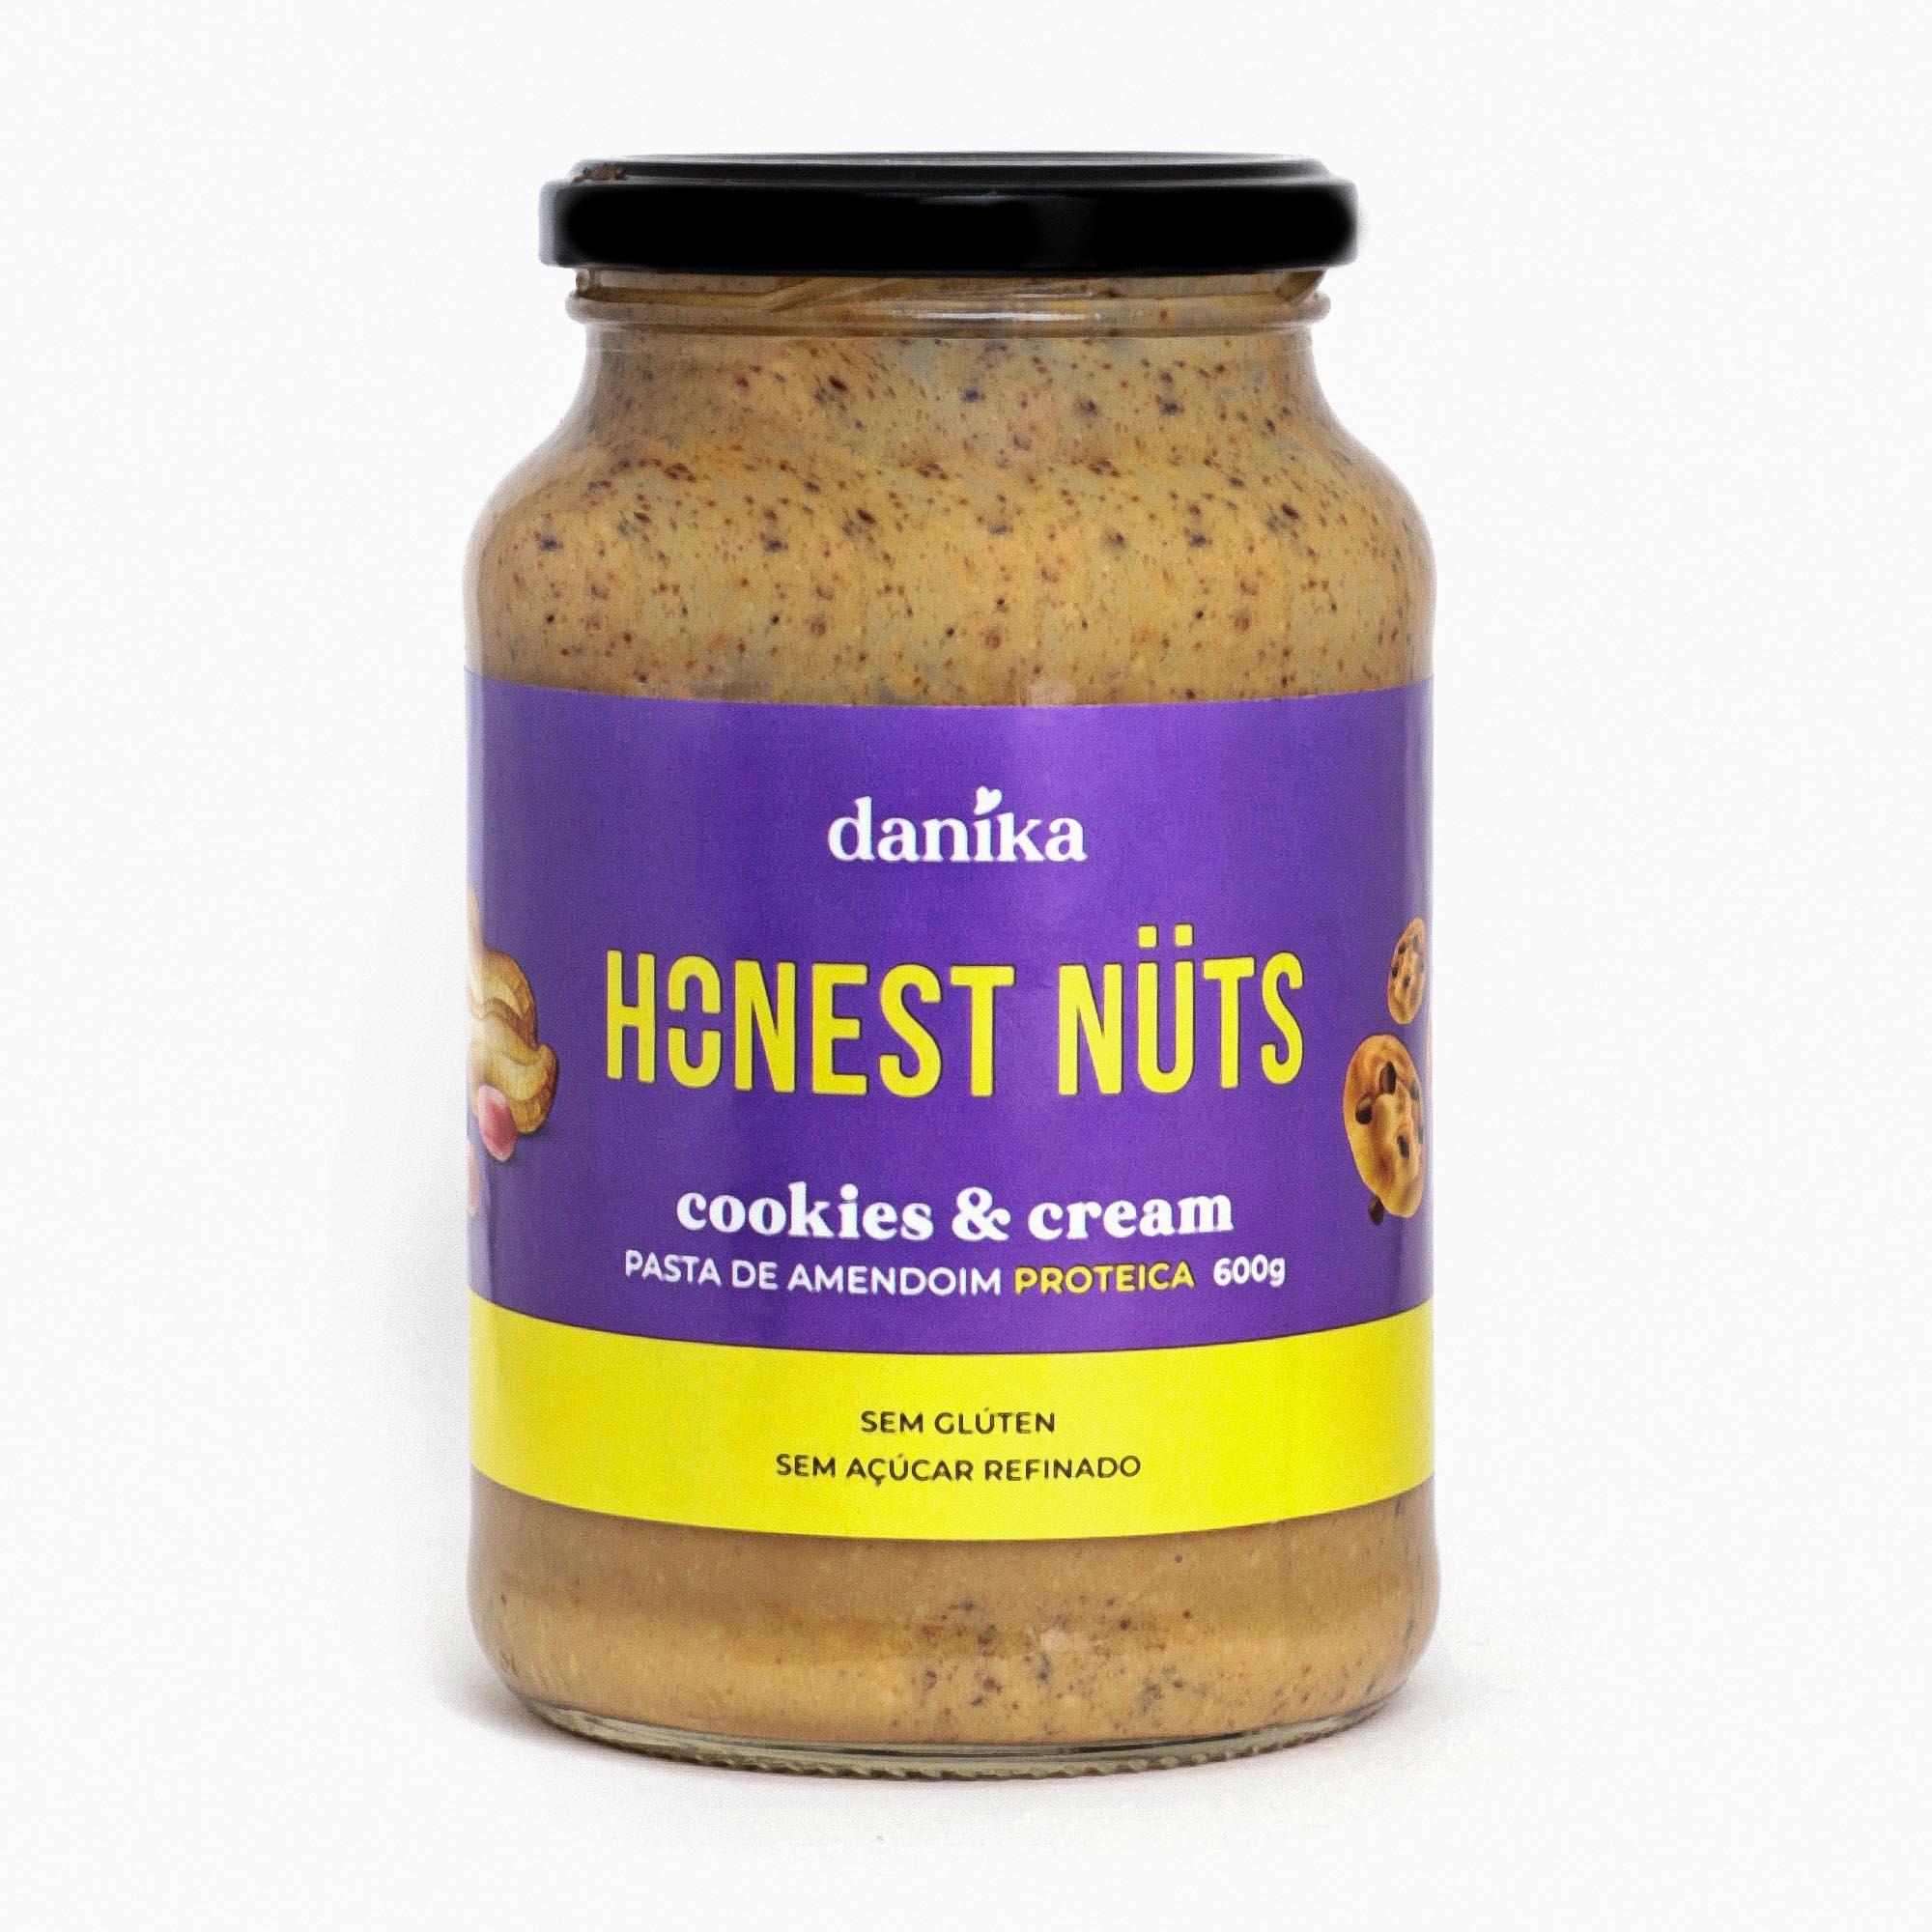 Cookies & Cream (600g)  - Honest Nuts